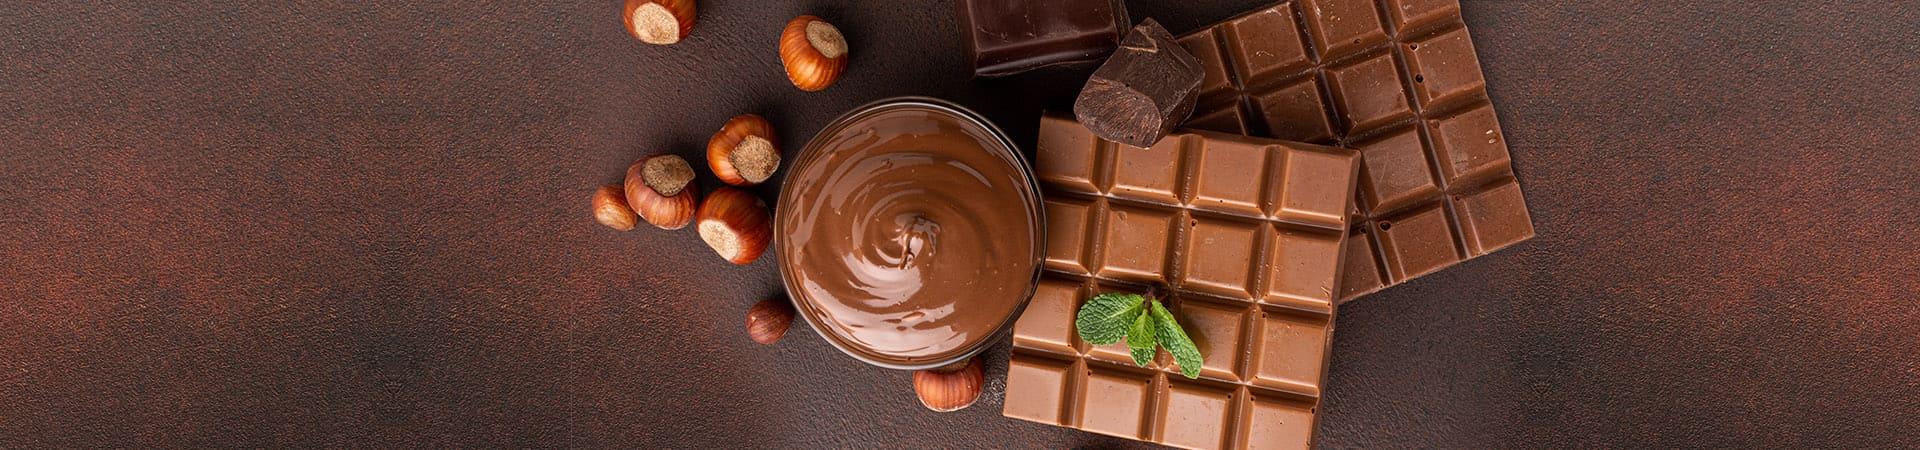 Chocolate Manufacturing